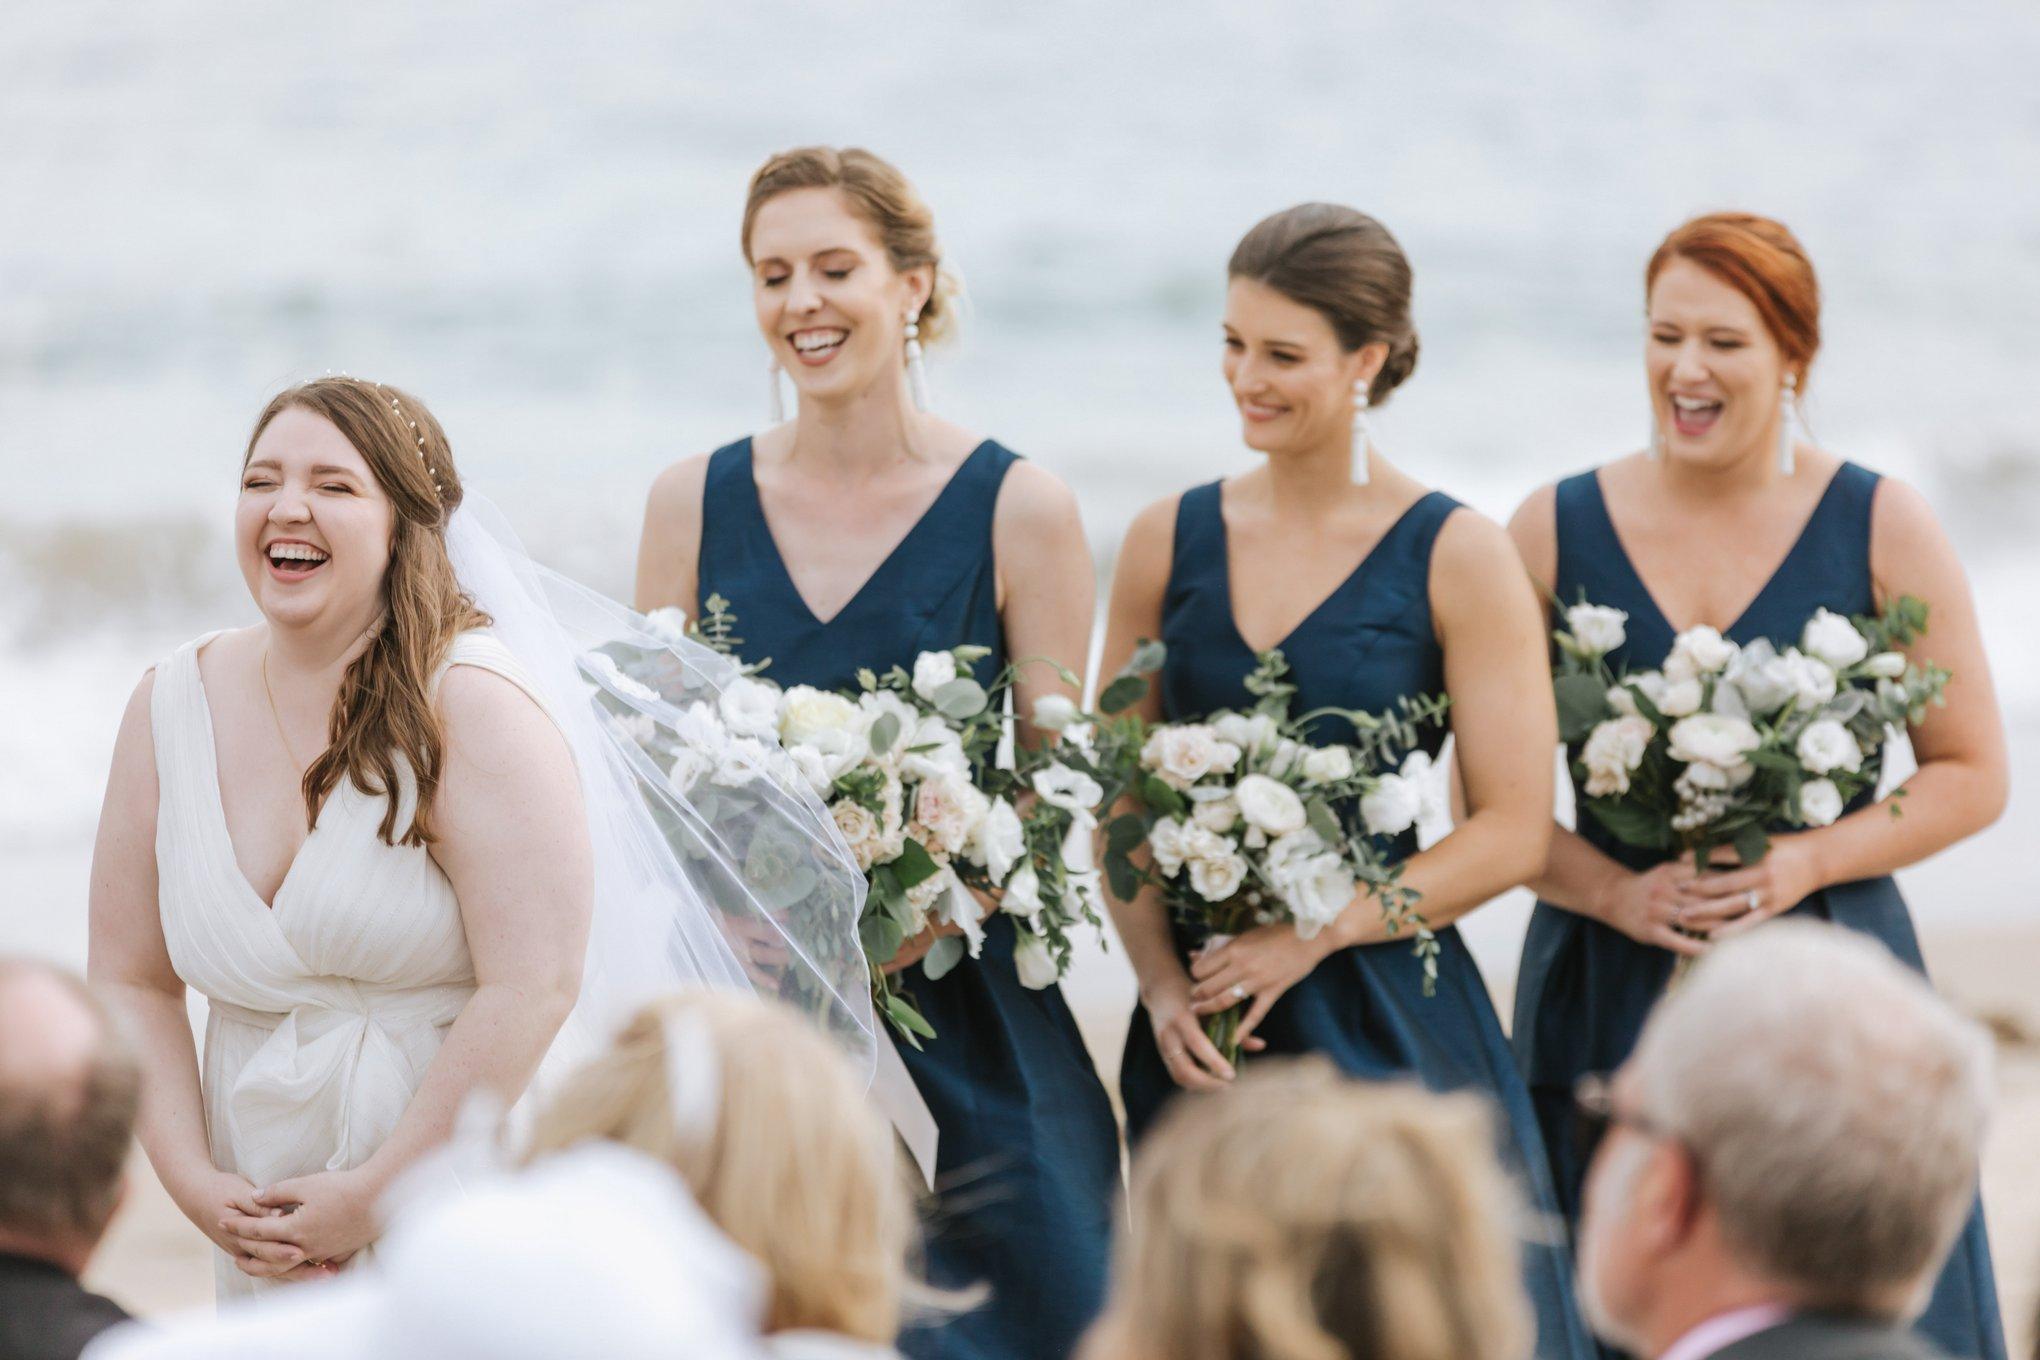 Newport-Wedding-Backyard-Photographer-19.jpg